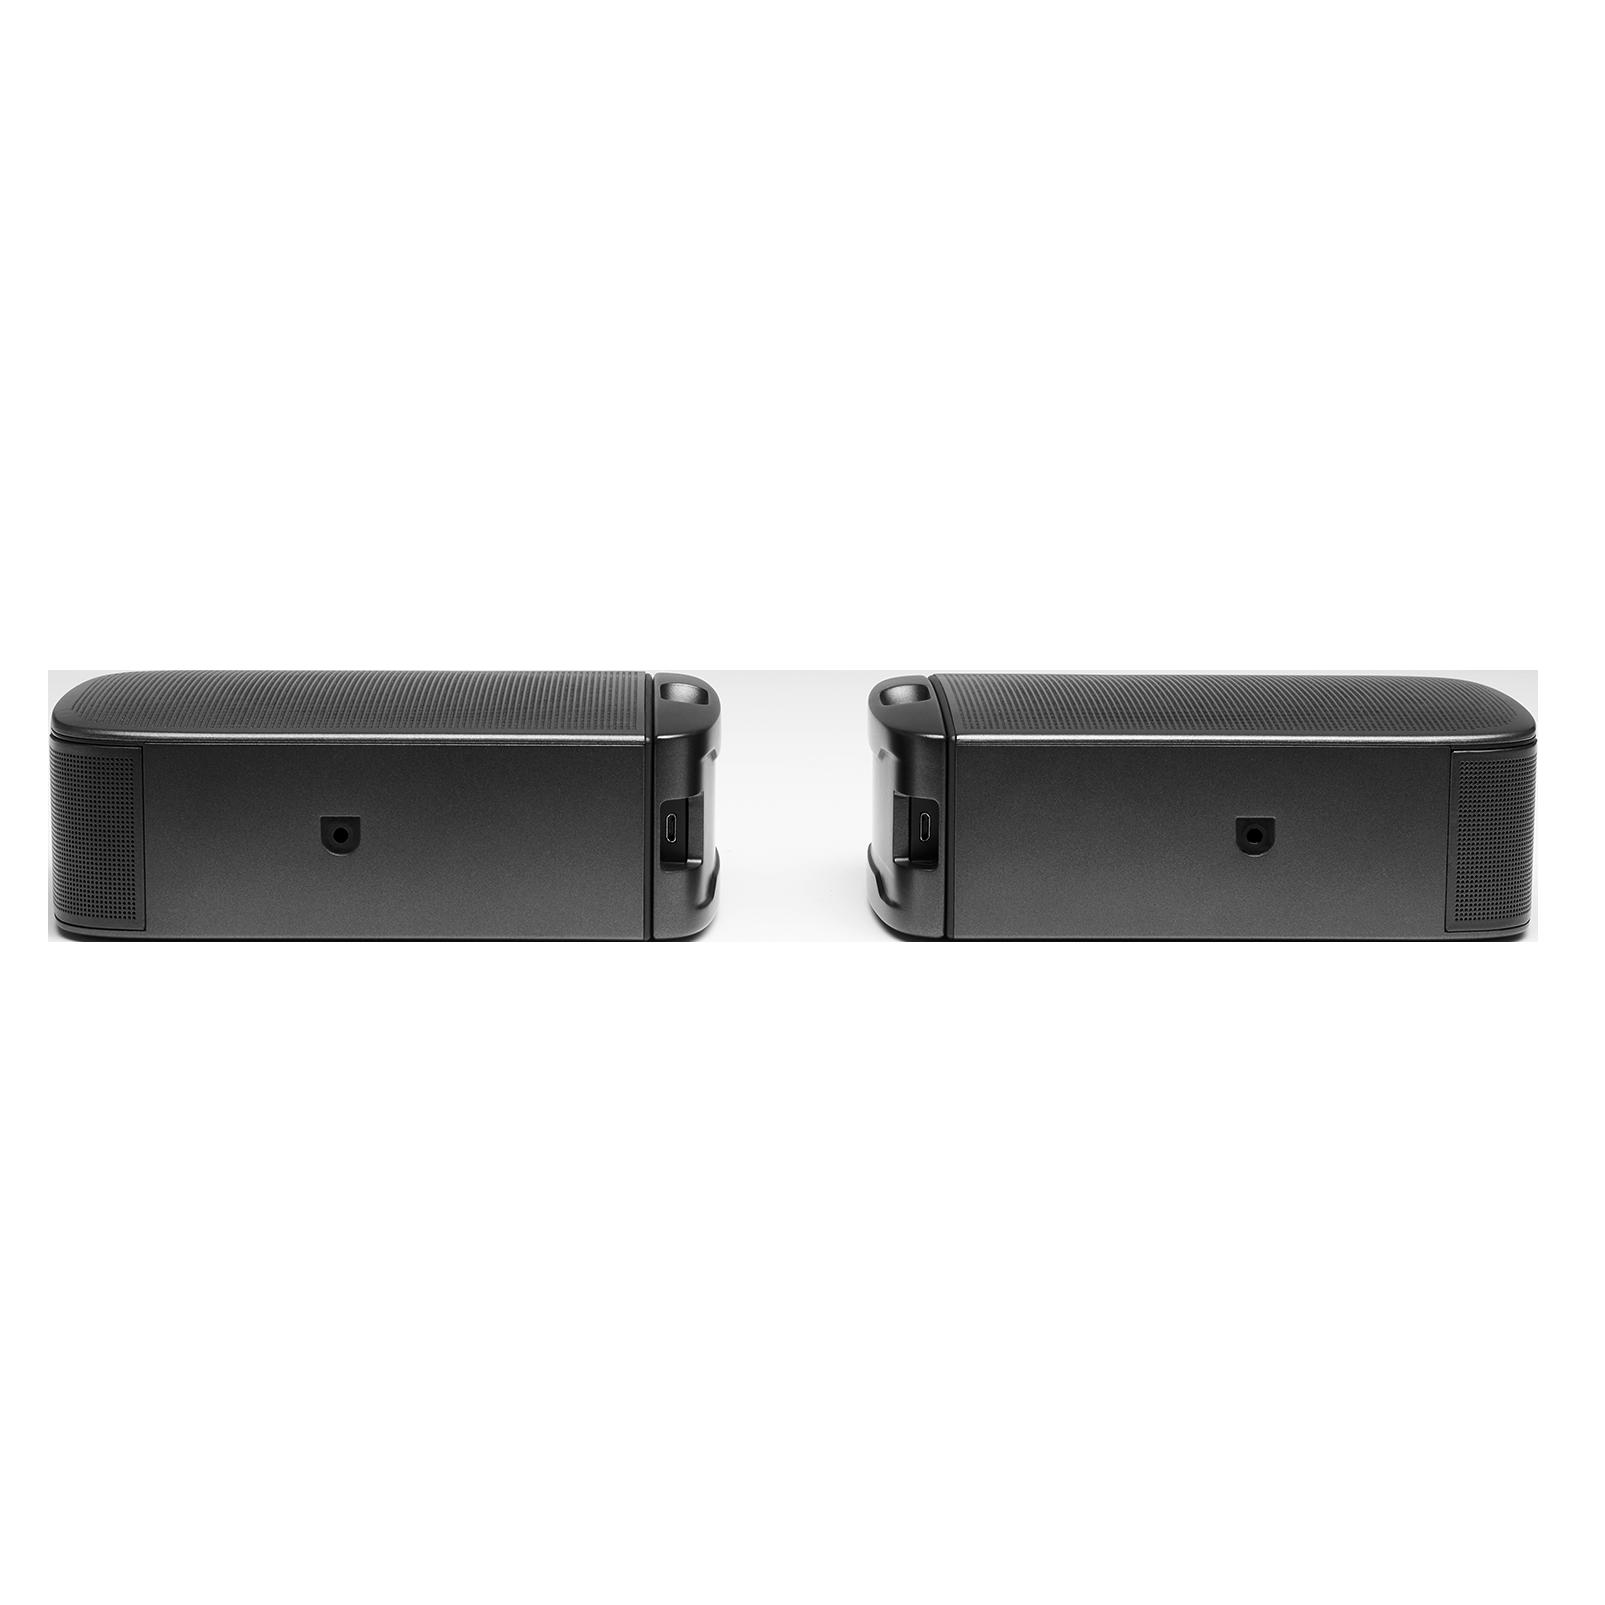 JBL BAR 9.1 True Wireless Surround with Dolby Atmos® - Black - Detailshot 9